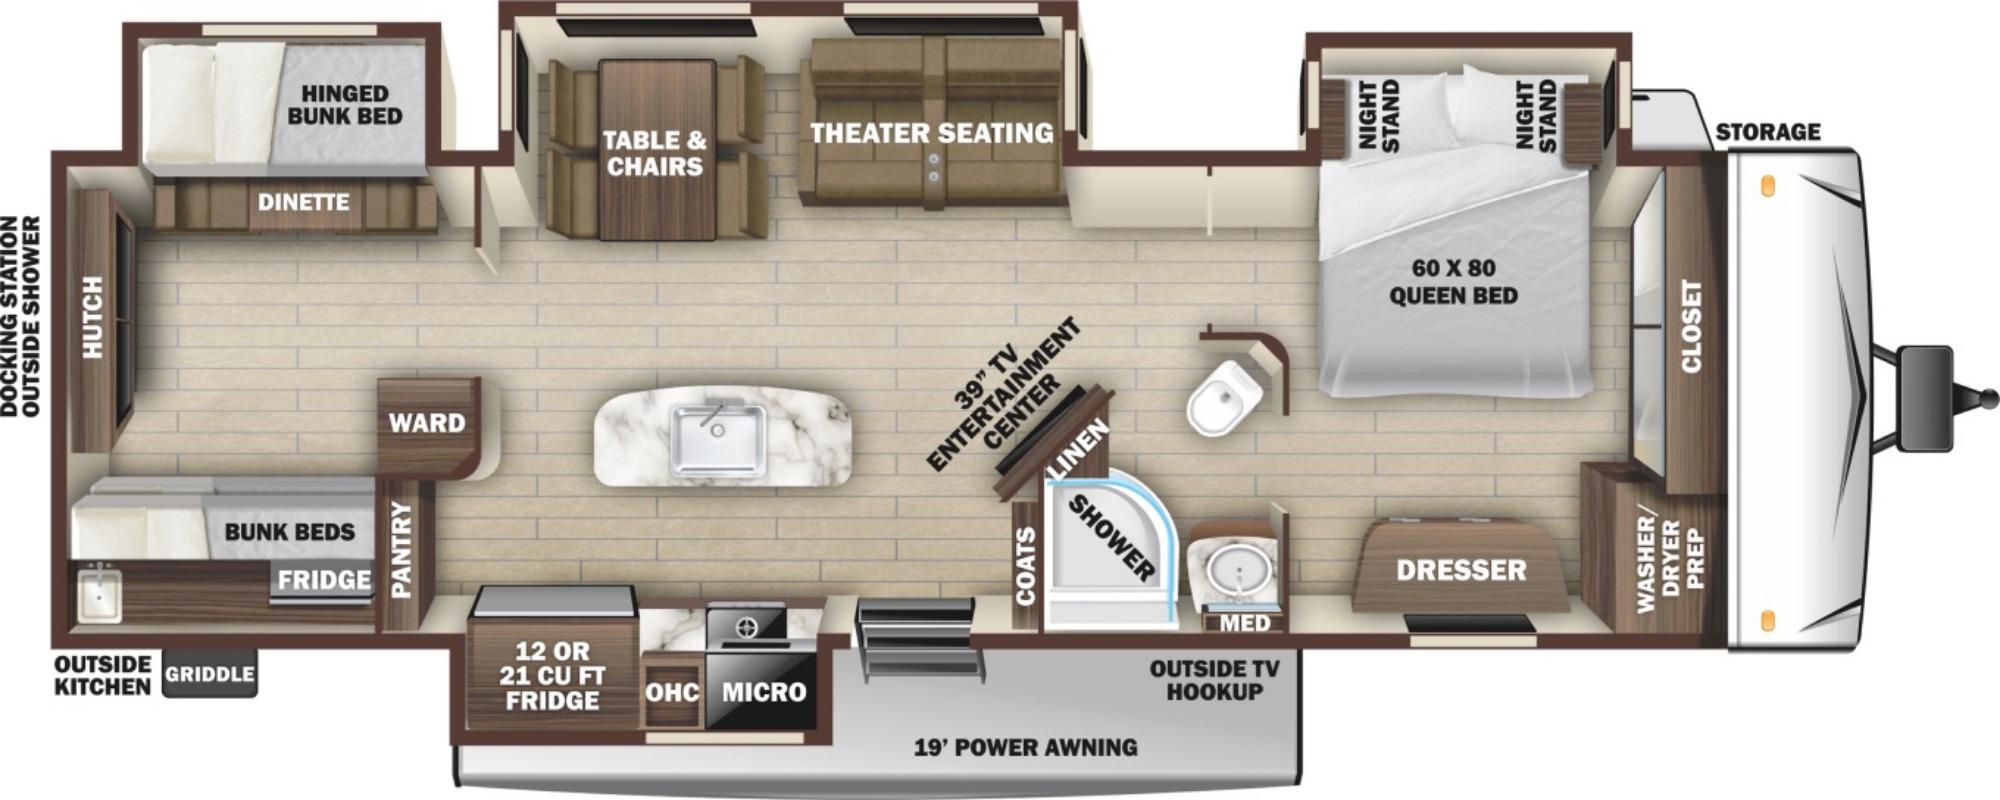 View Floor Plan for 2021 HIGHLAND RIDGE OPEN RANGE 330BHS